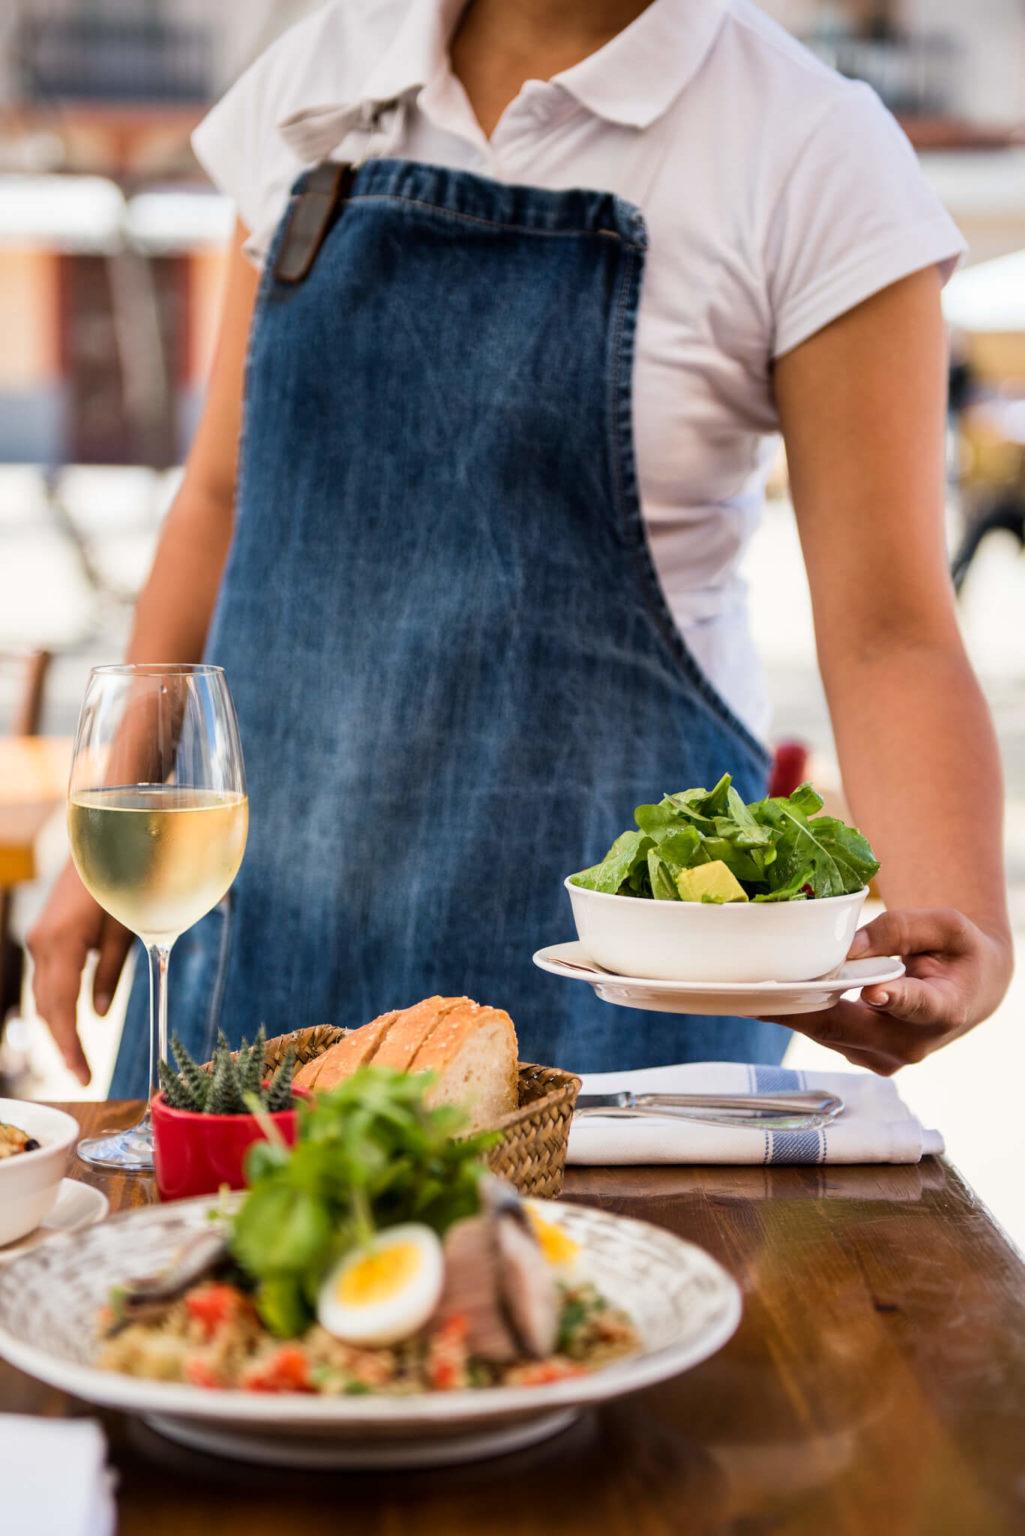 https://www.white-ibiza.com/wp-content/uploads/2020/03/white-ibiza-restaurants-locals-only-2020-10-1025x1536.jpg